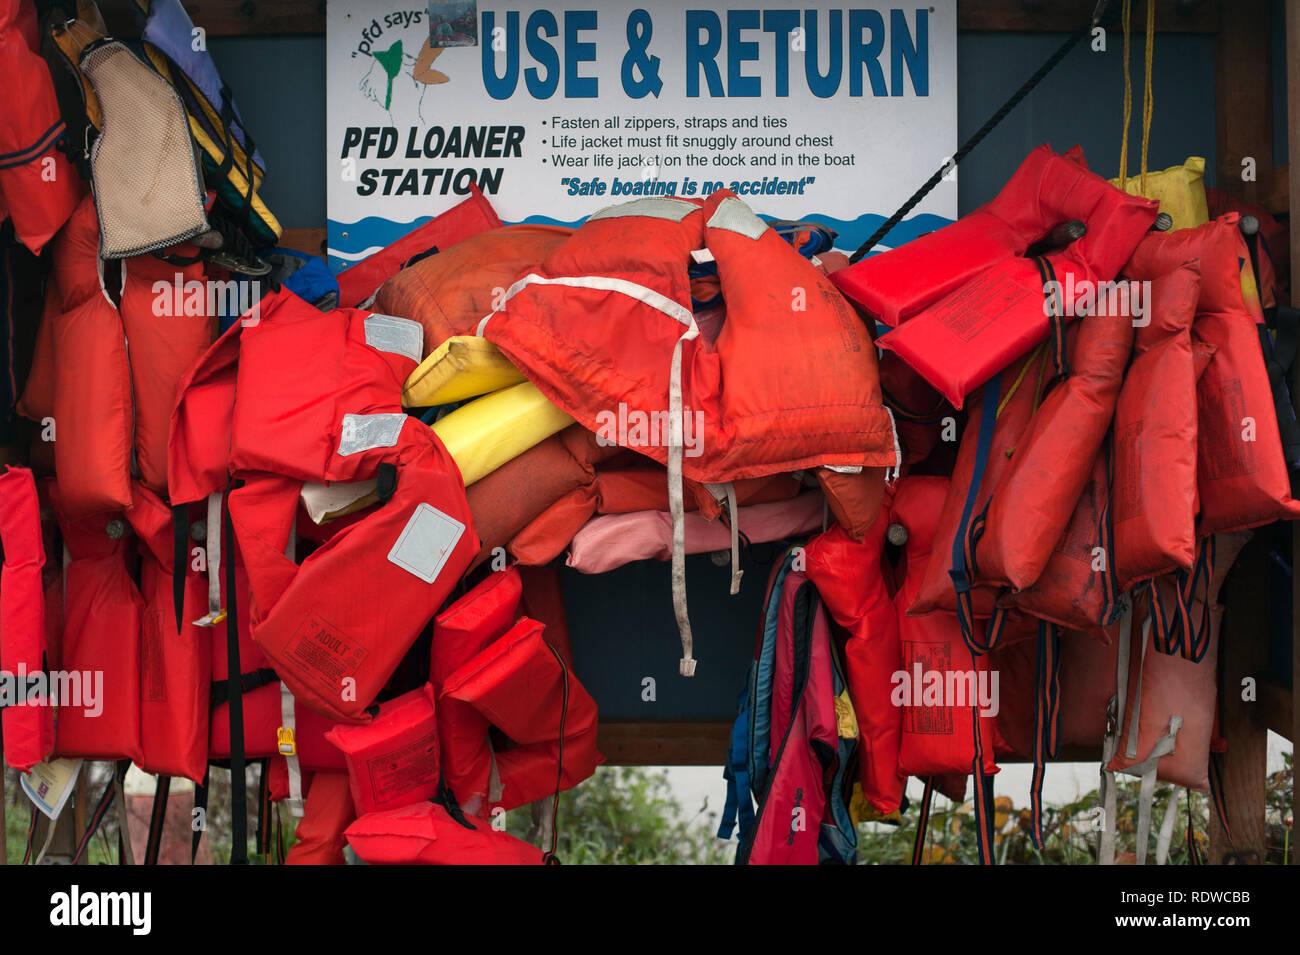 Life Preservers for use at Everett marina - Stock Image